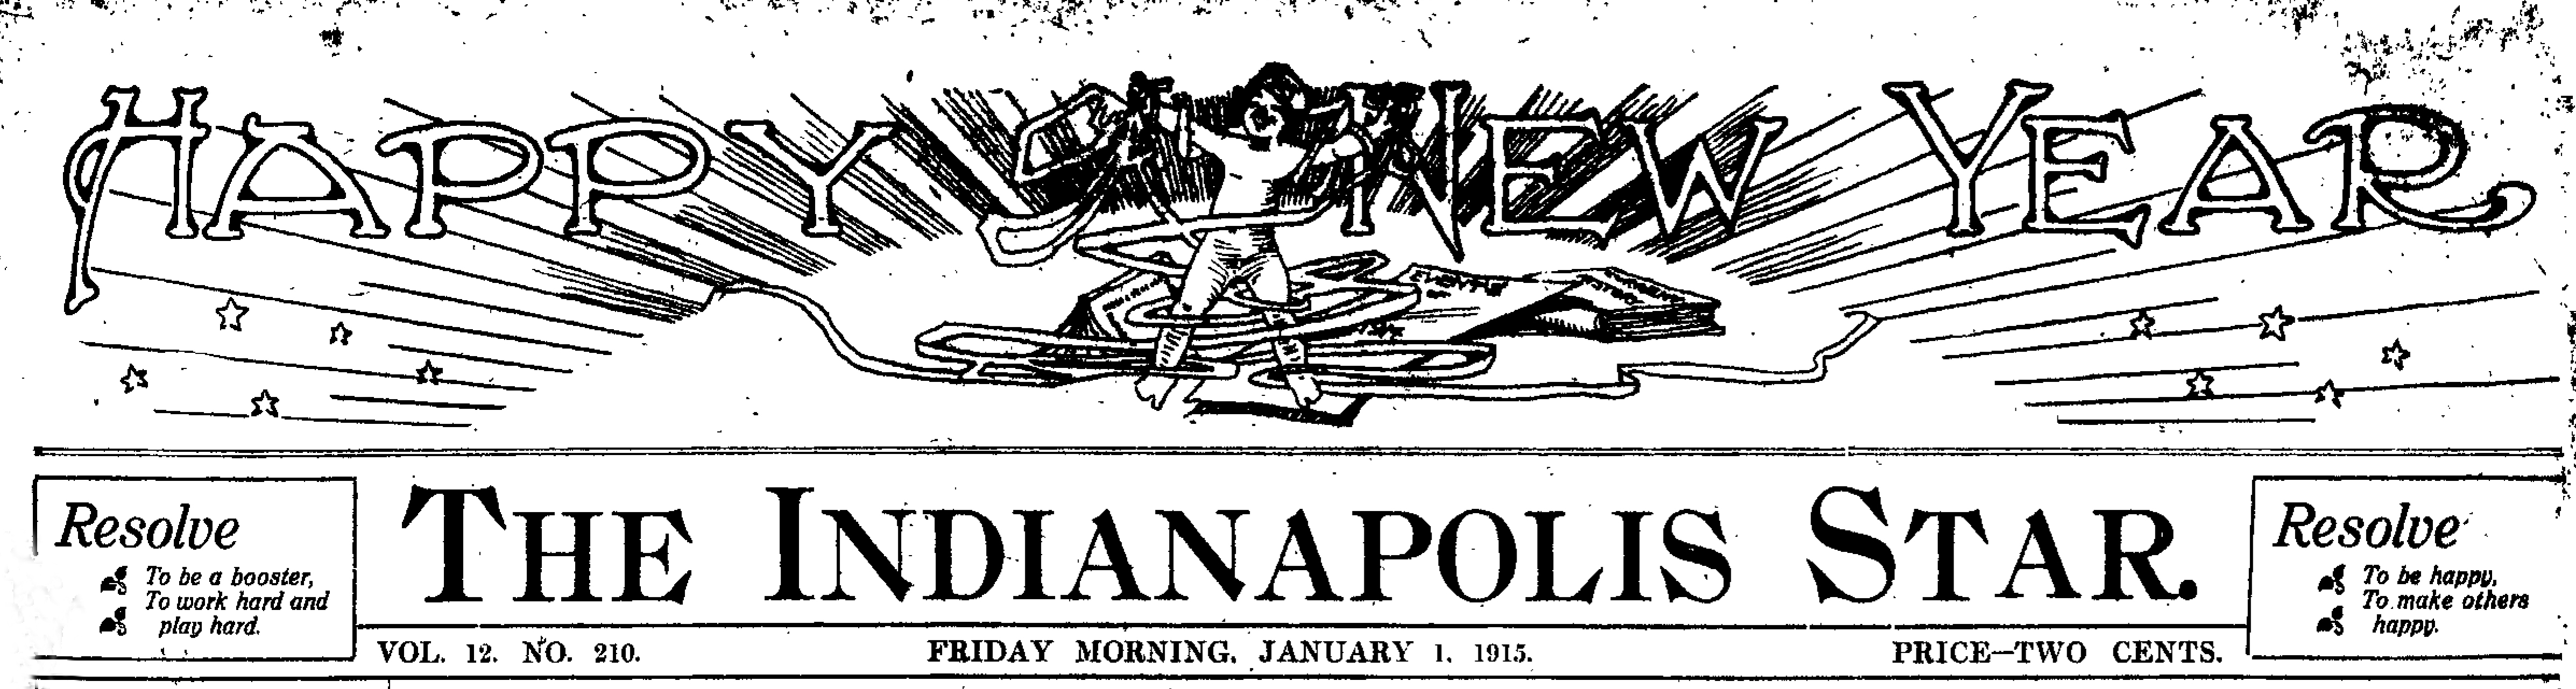 Sunday Adverts: Happy New Year 1915